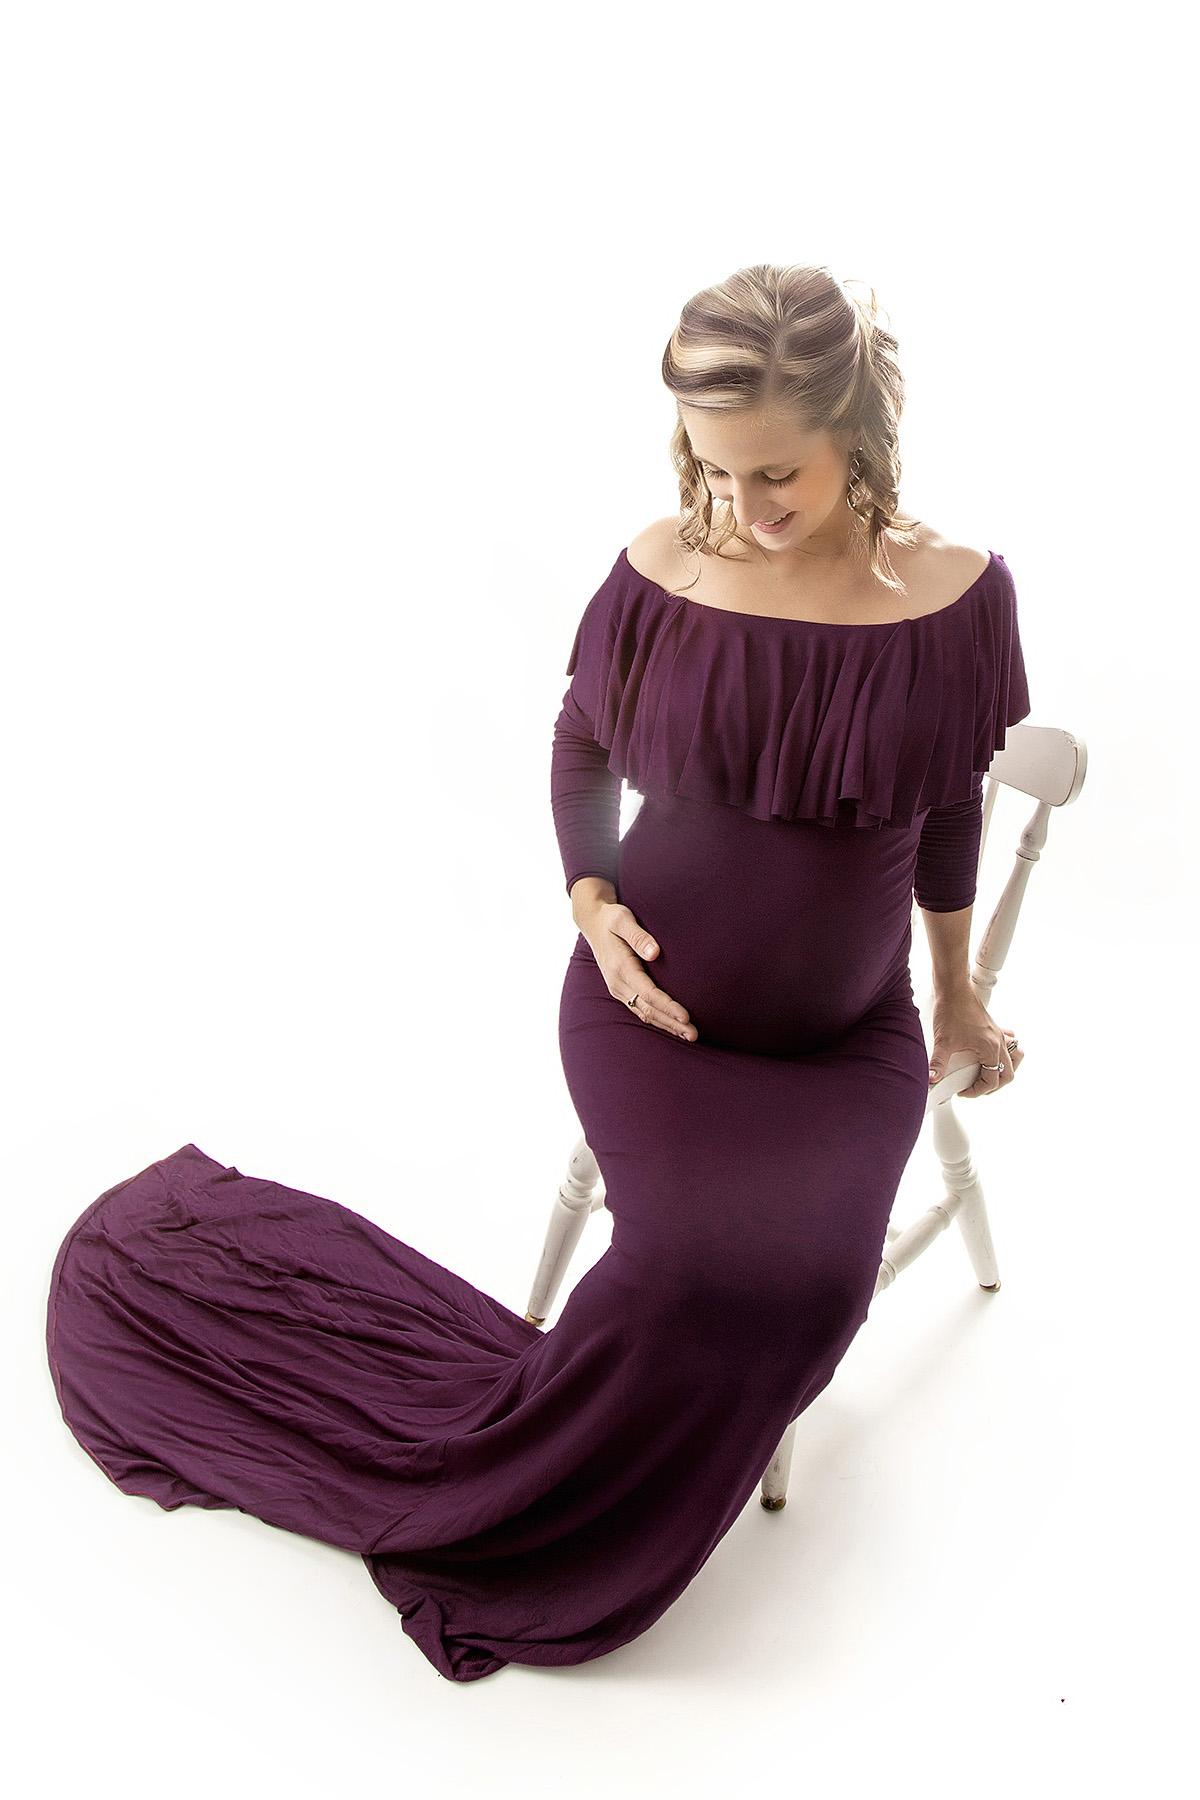 Angie_Englerth_Lancater_Maternity_Photographer_Wardobe_Purple_002.jpg